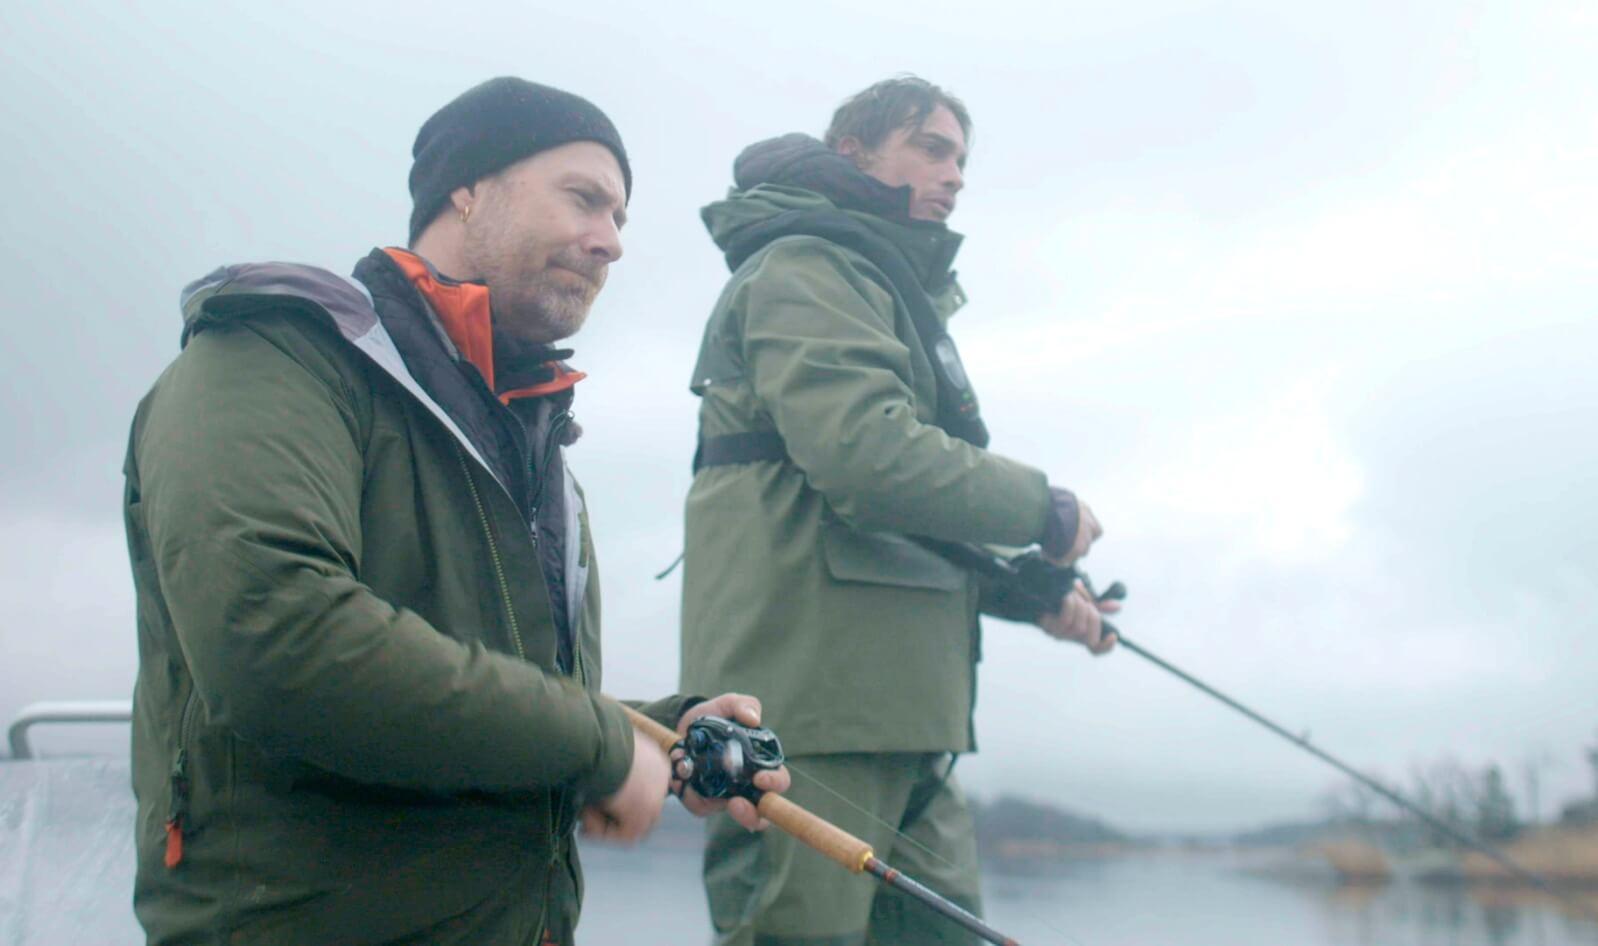 Fiskefeber sesong 1